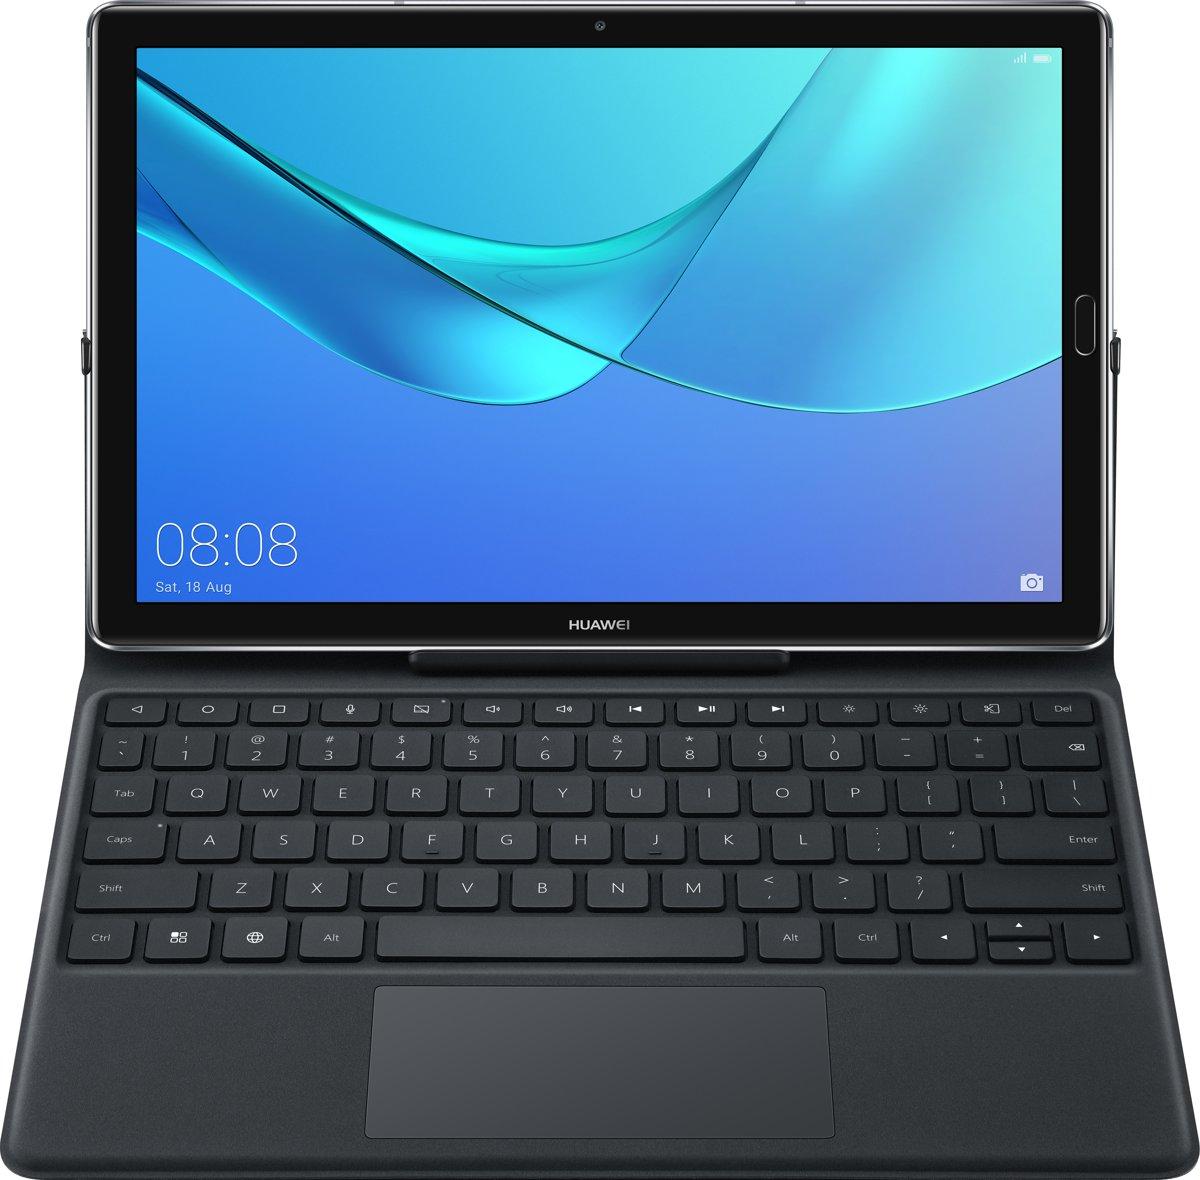 Huawei M5(pro) 10 inch Keyboard - leren case(Qwerty) kopen